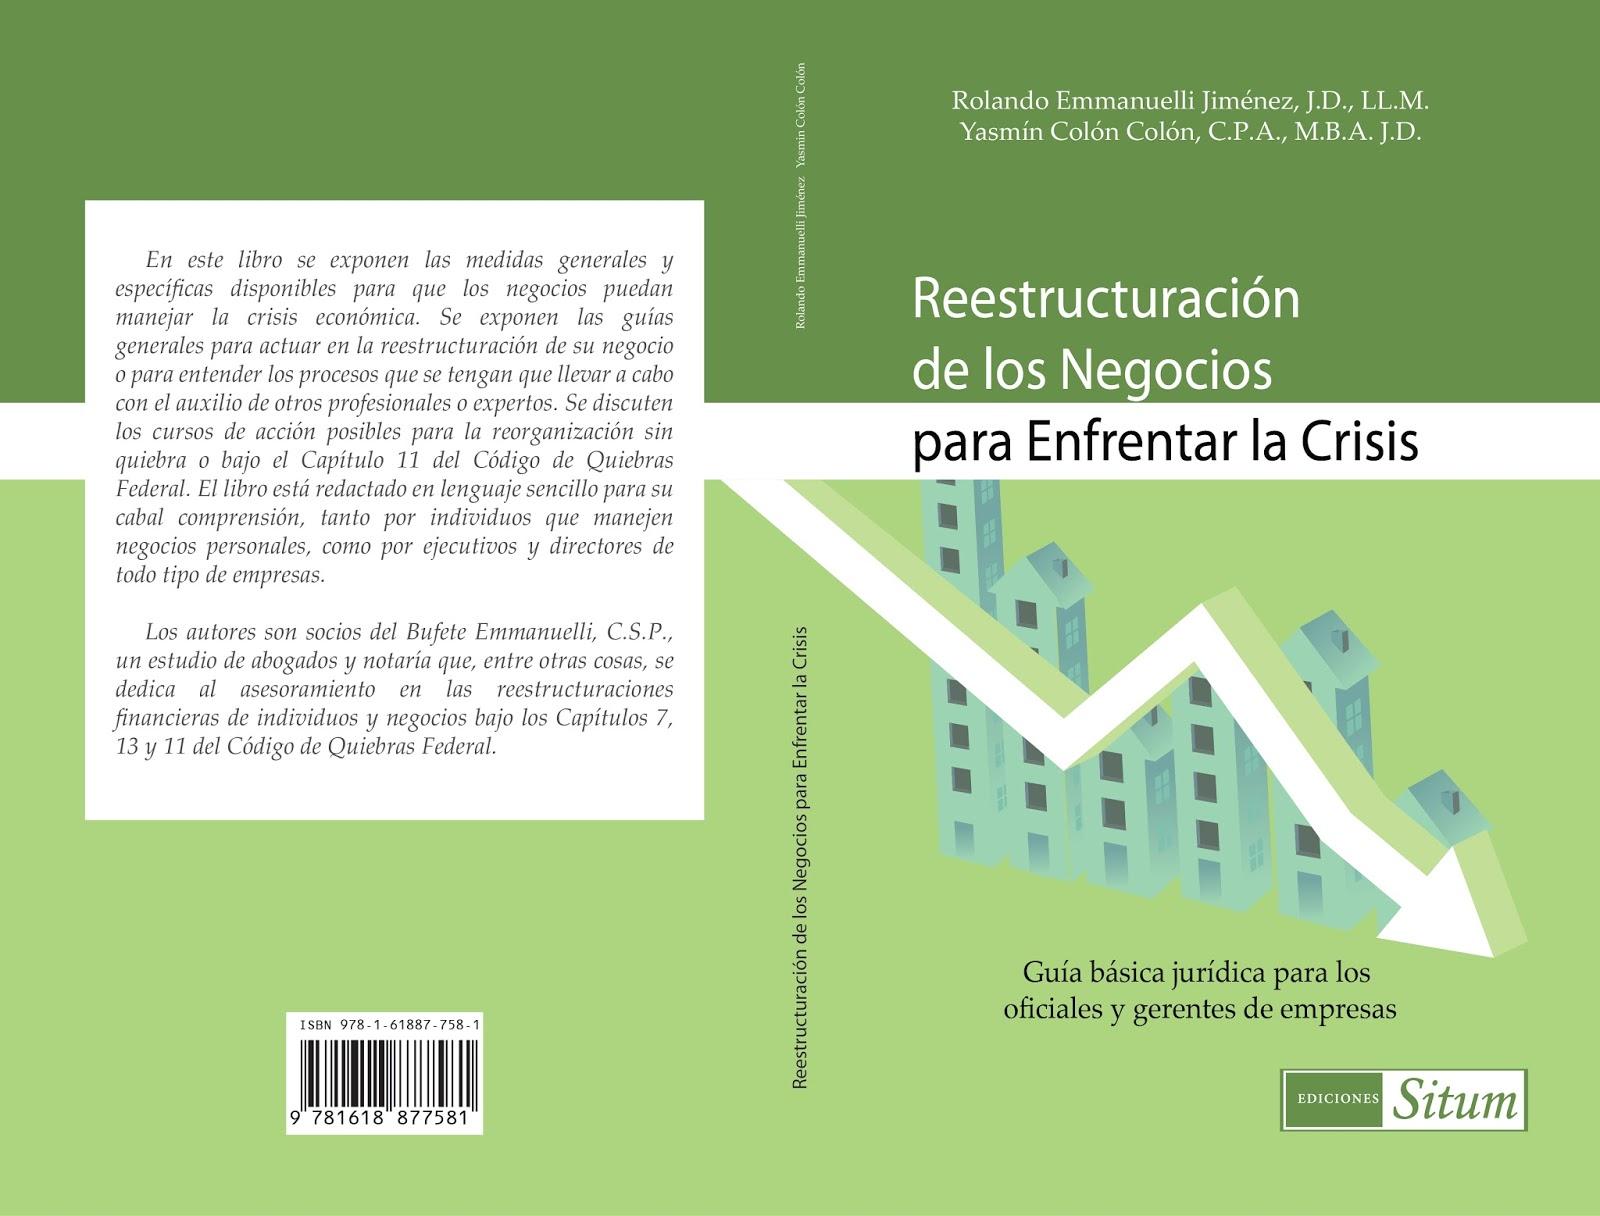 http://3.bp.blogspot.com/-HY5qh7NwYgw/VrEFSSLJi2I/AAAAAAACHhM/f4Bm6yAFo-w/s1600/Portada%2BLibro%2BReestructuracio%25CC%2581n%2Bde%2BNegocios.jpg